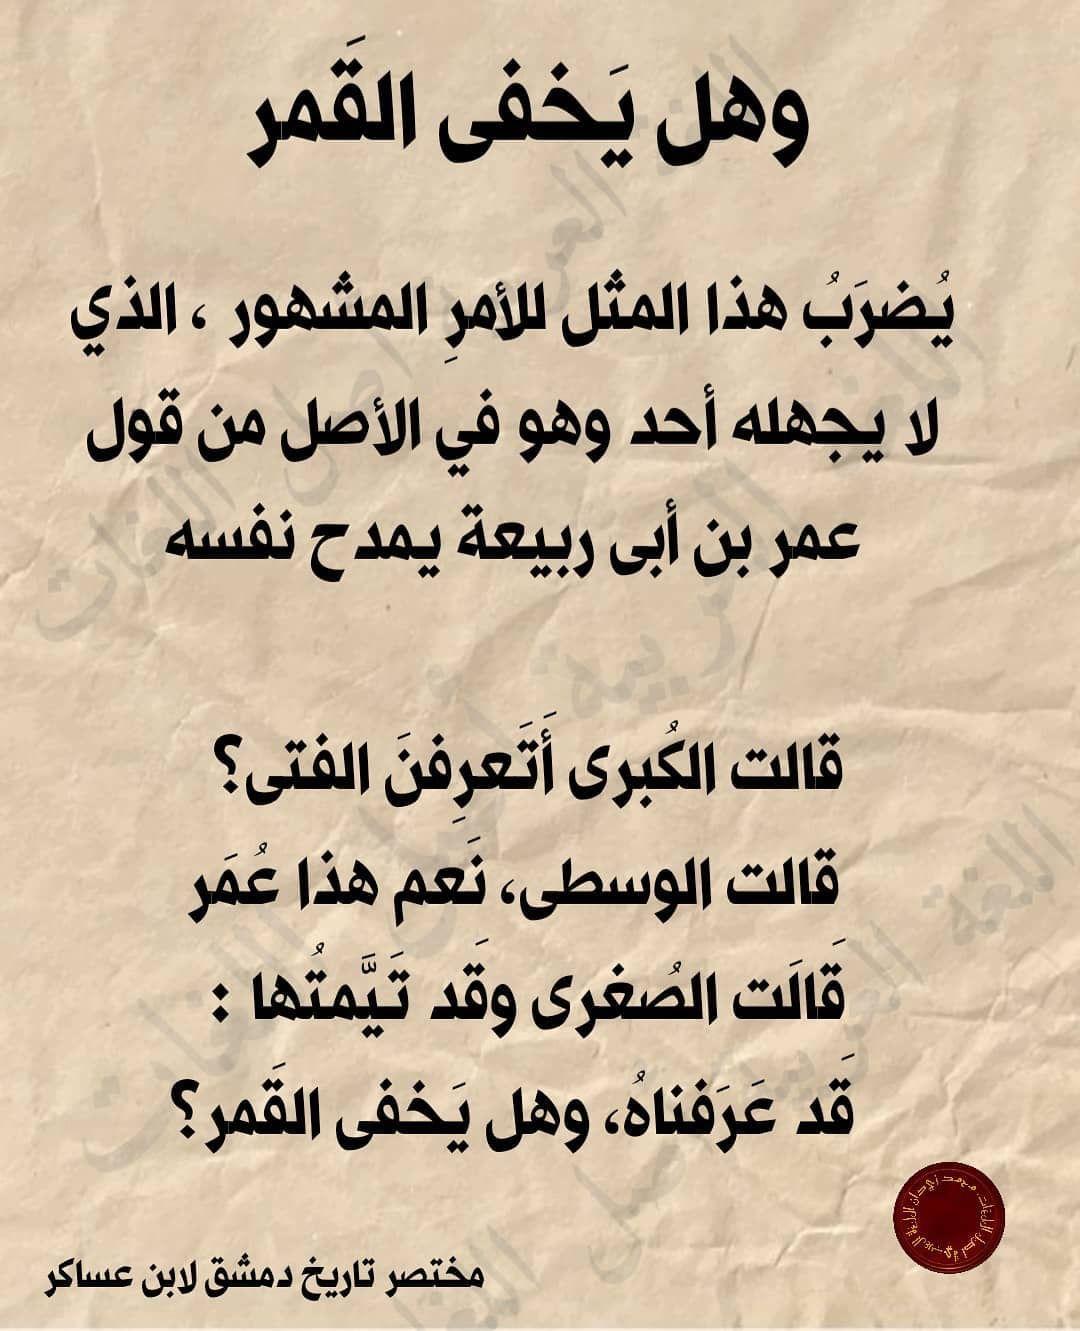 Pin By Soso On حكم وأمثال في اللغة Pretty Words Beautiful Arabic Words Quotes